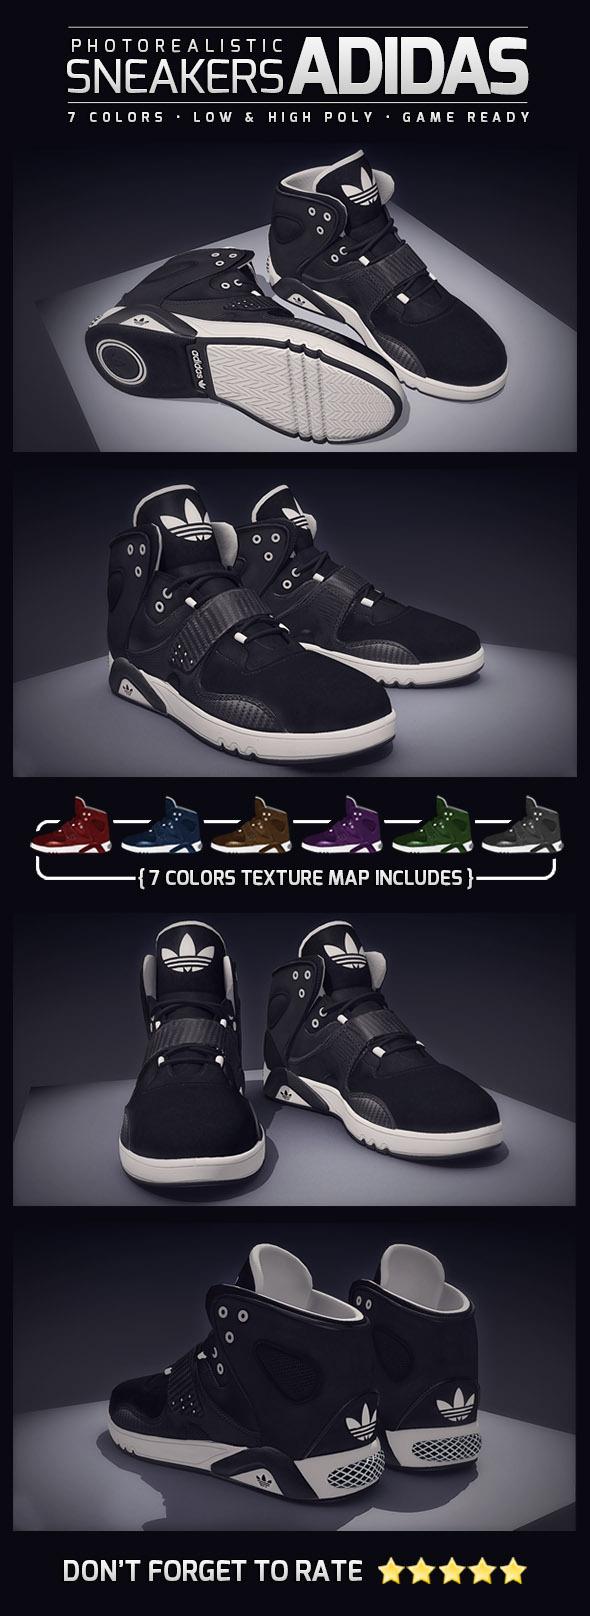 3DOcean Sneakers Adidas Photorealistic 7377548